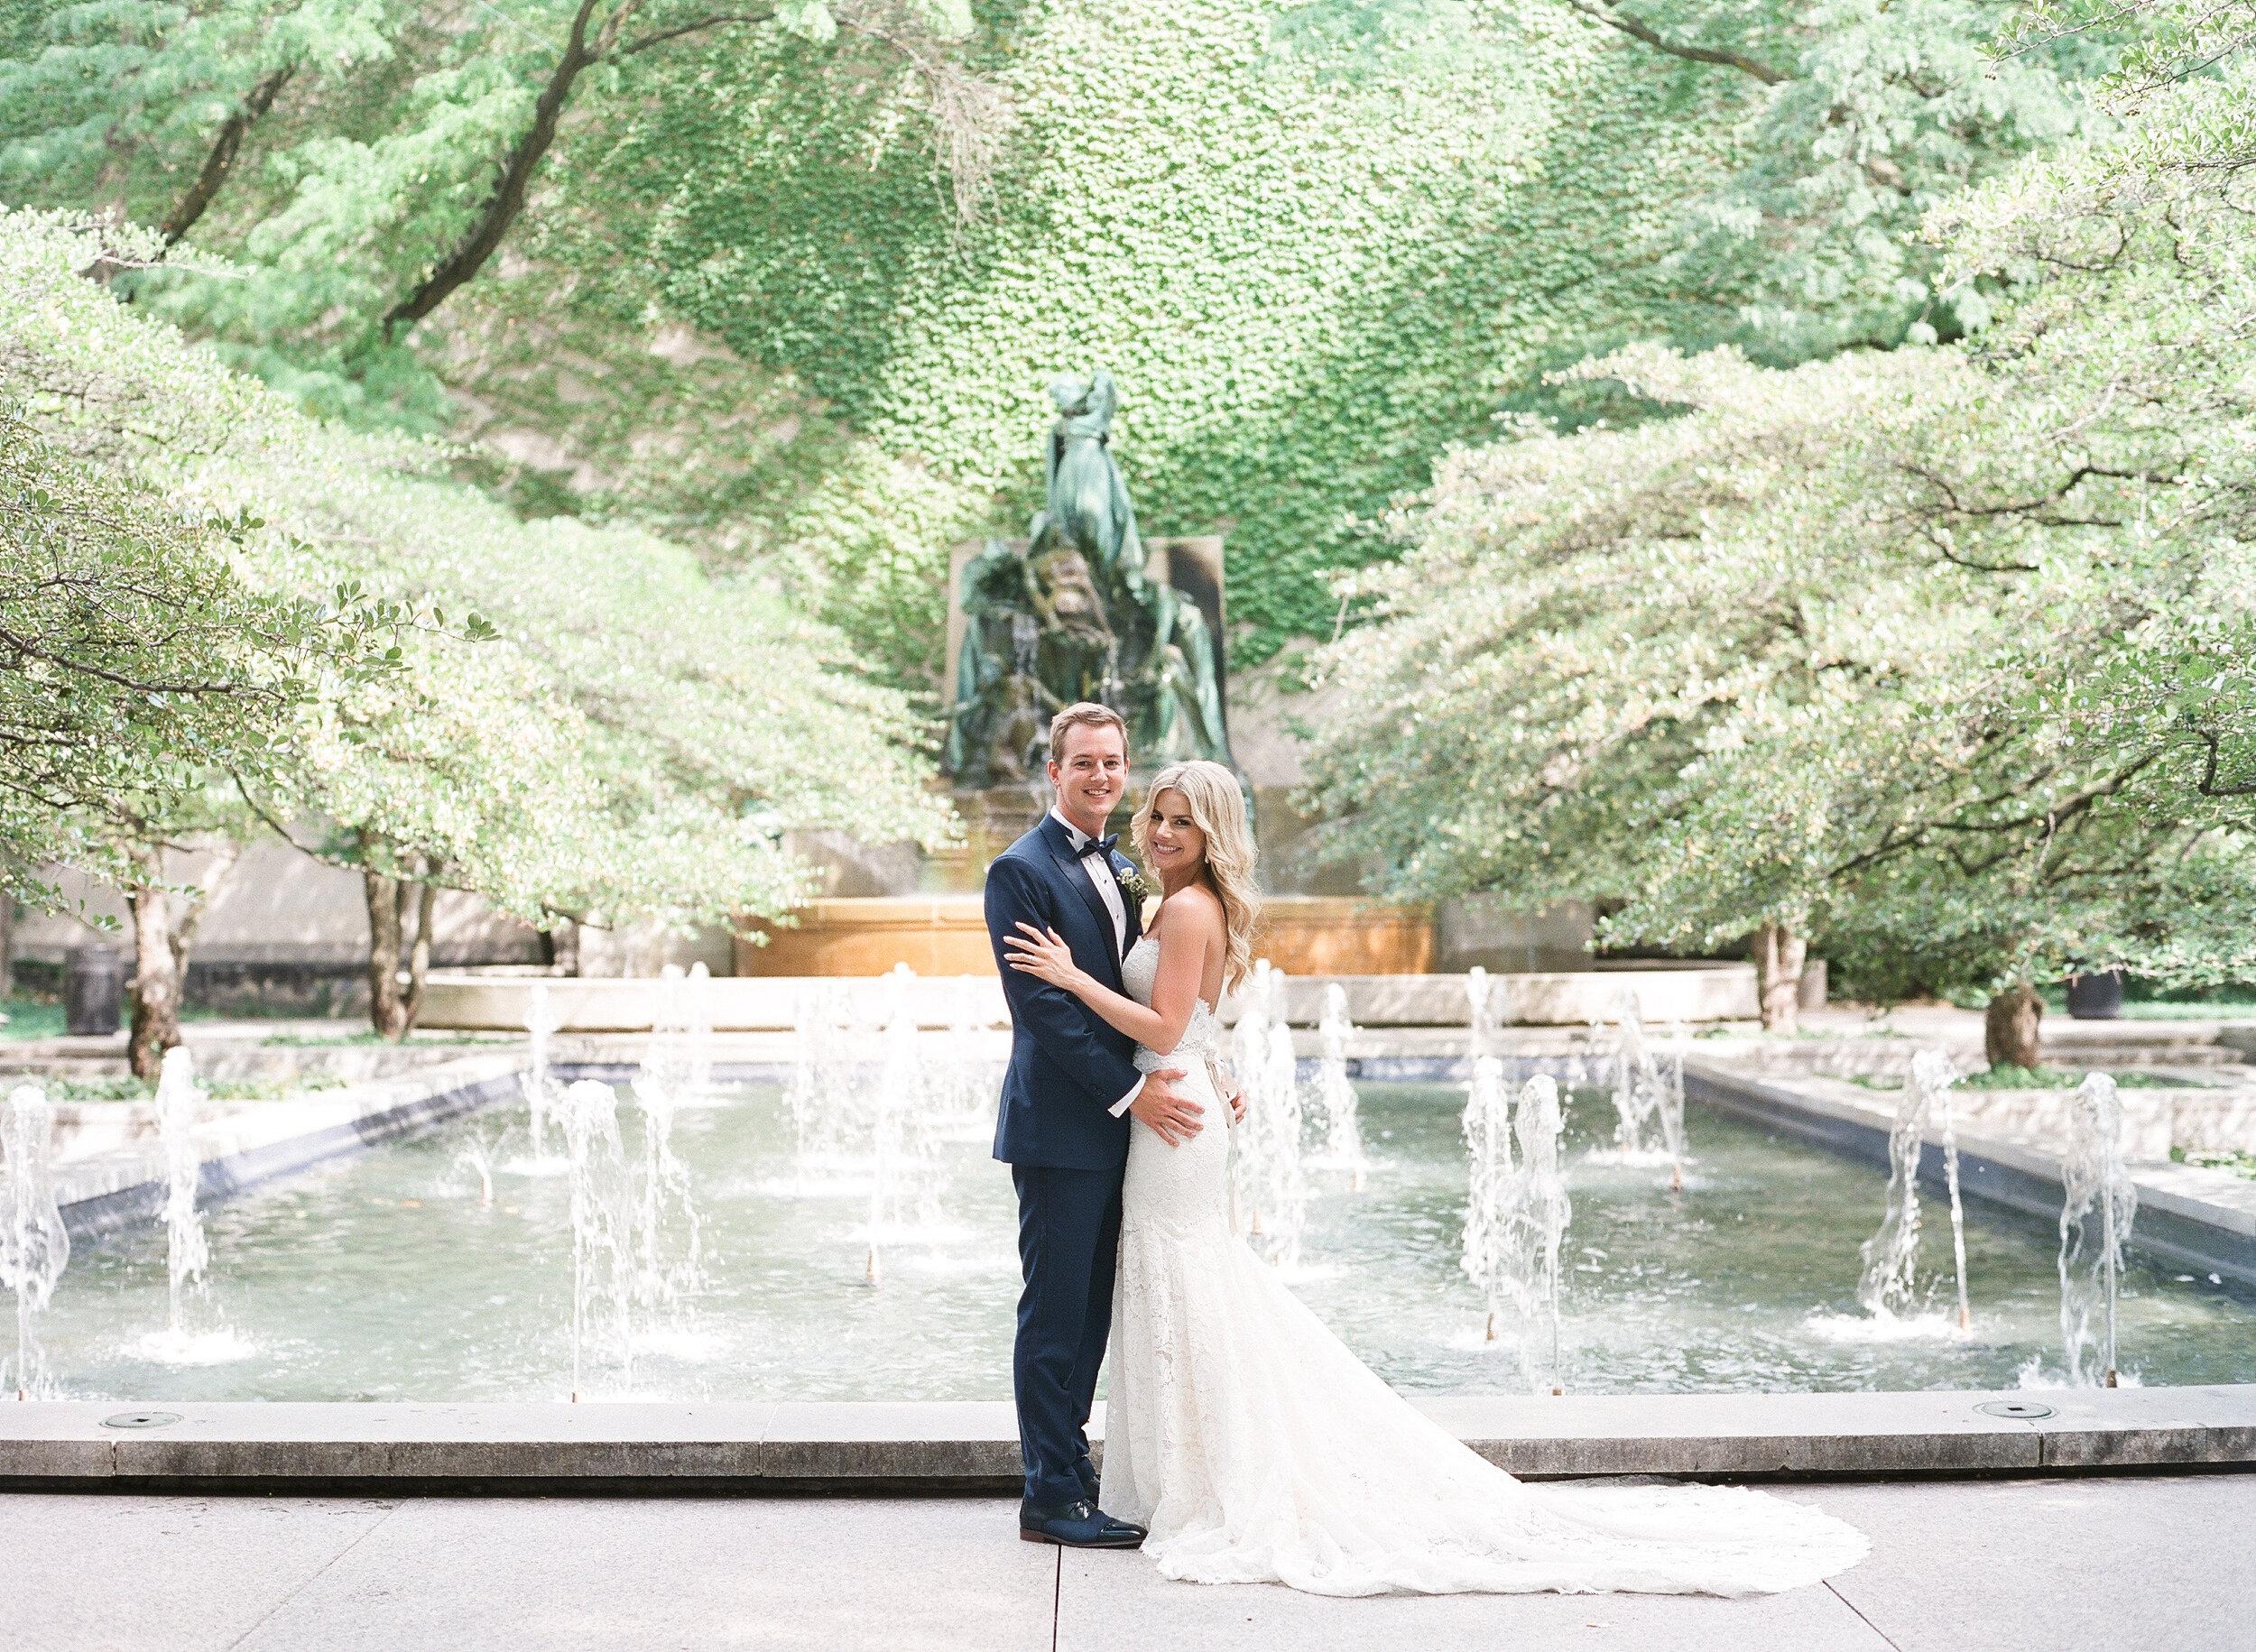 Bonphotage Chicago Fine Art Film Wedding Photography